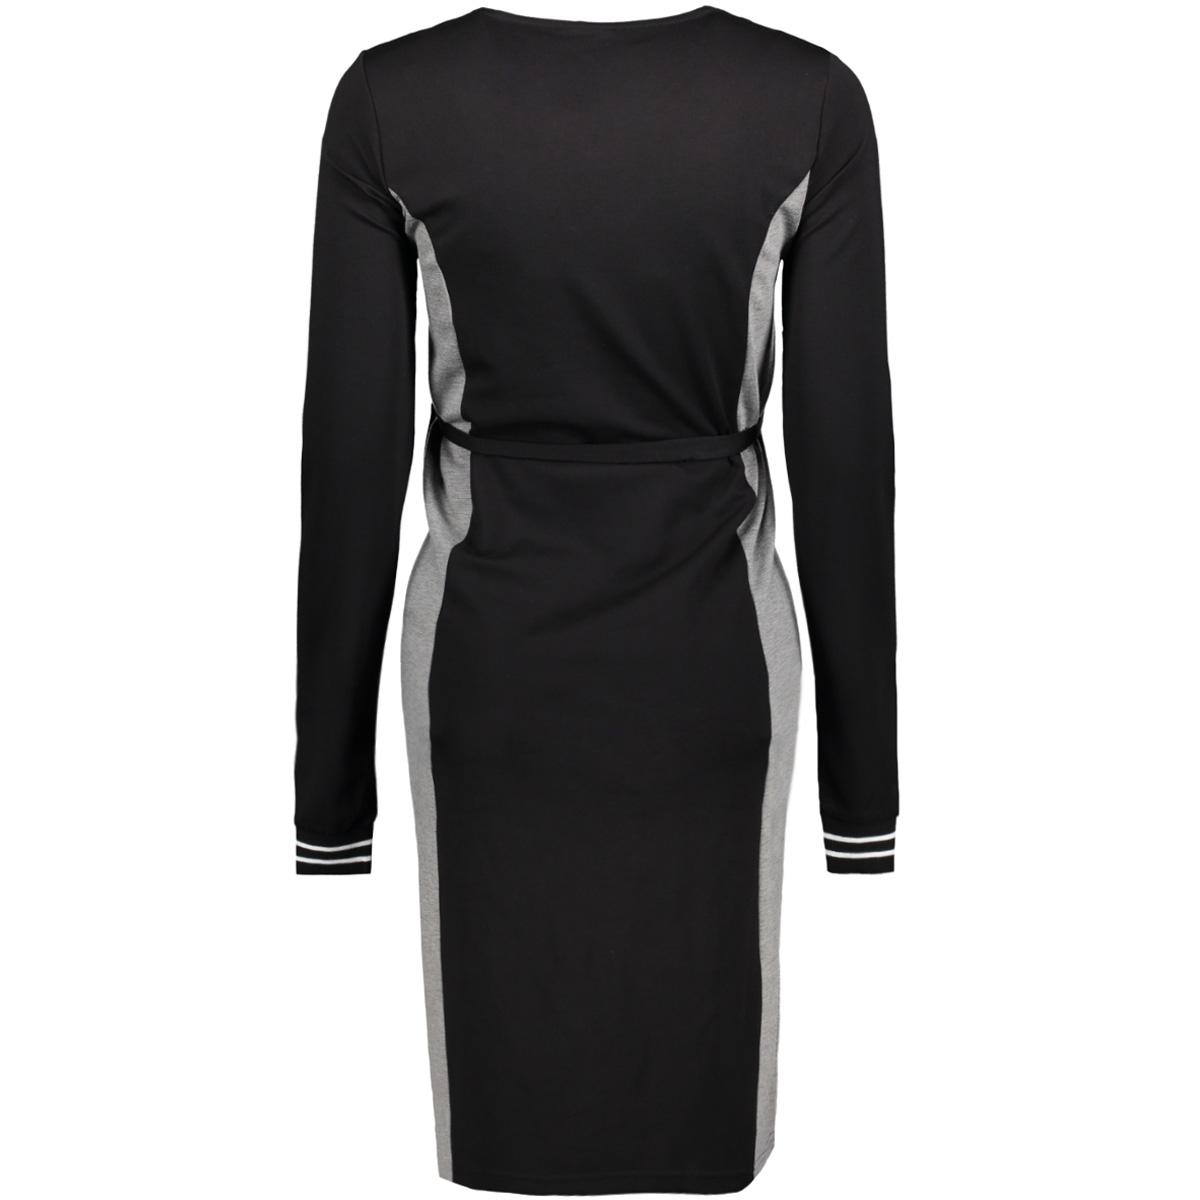 mlvarna l/s jersey abk dress 20008113 mama-licious positie jurk black